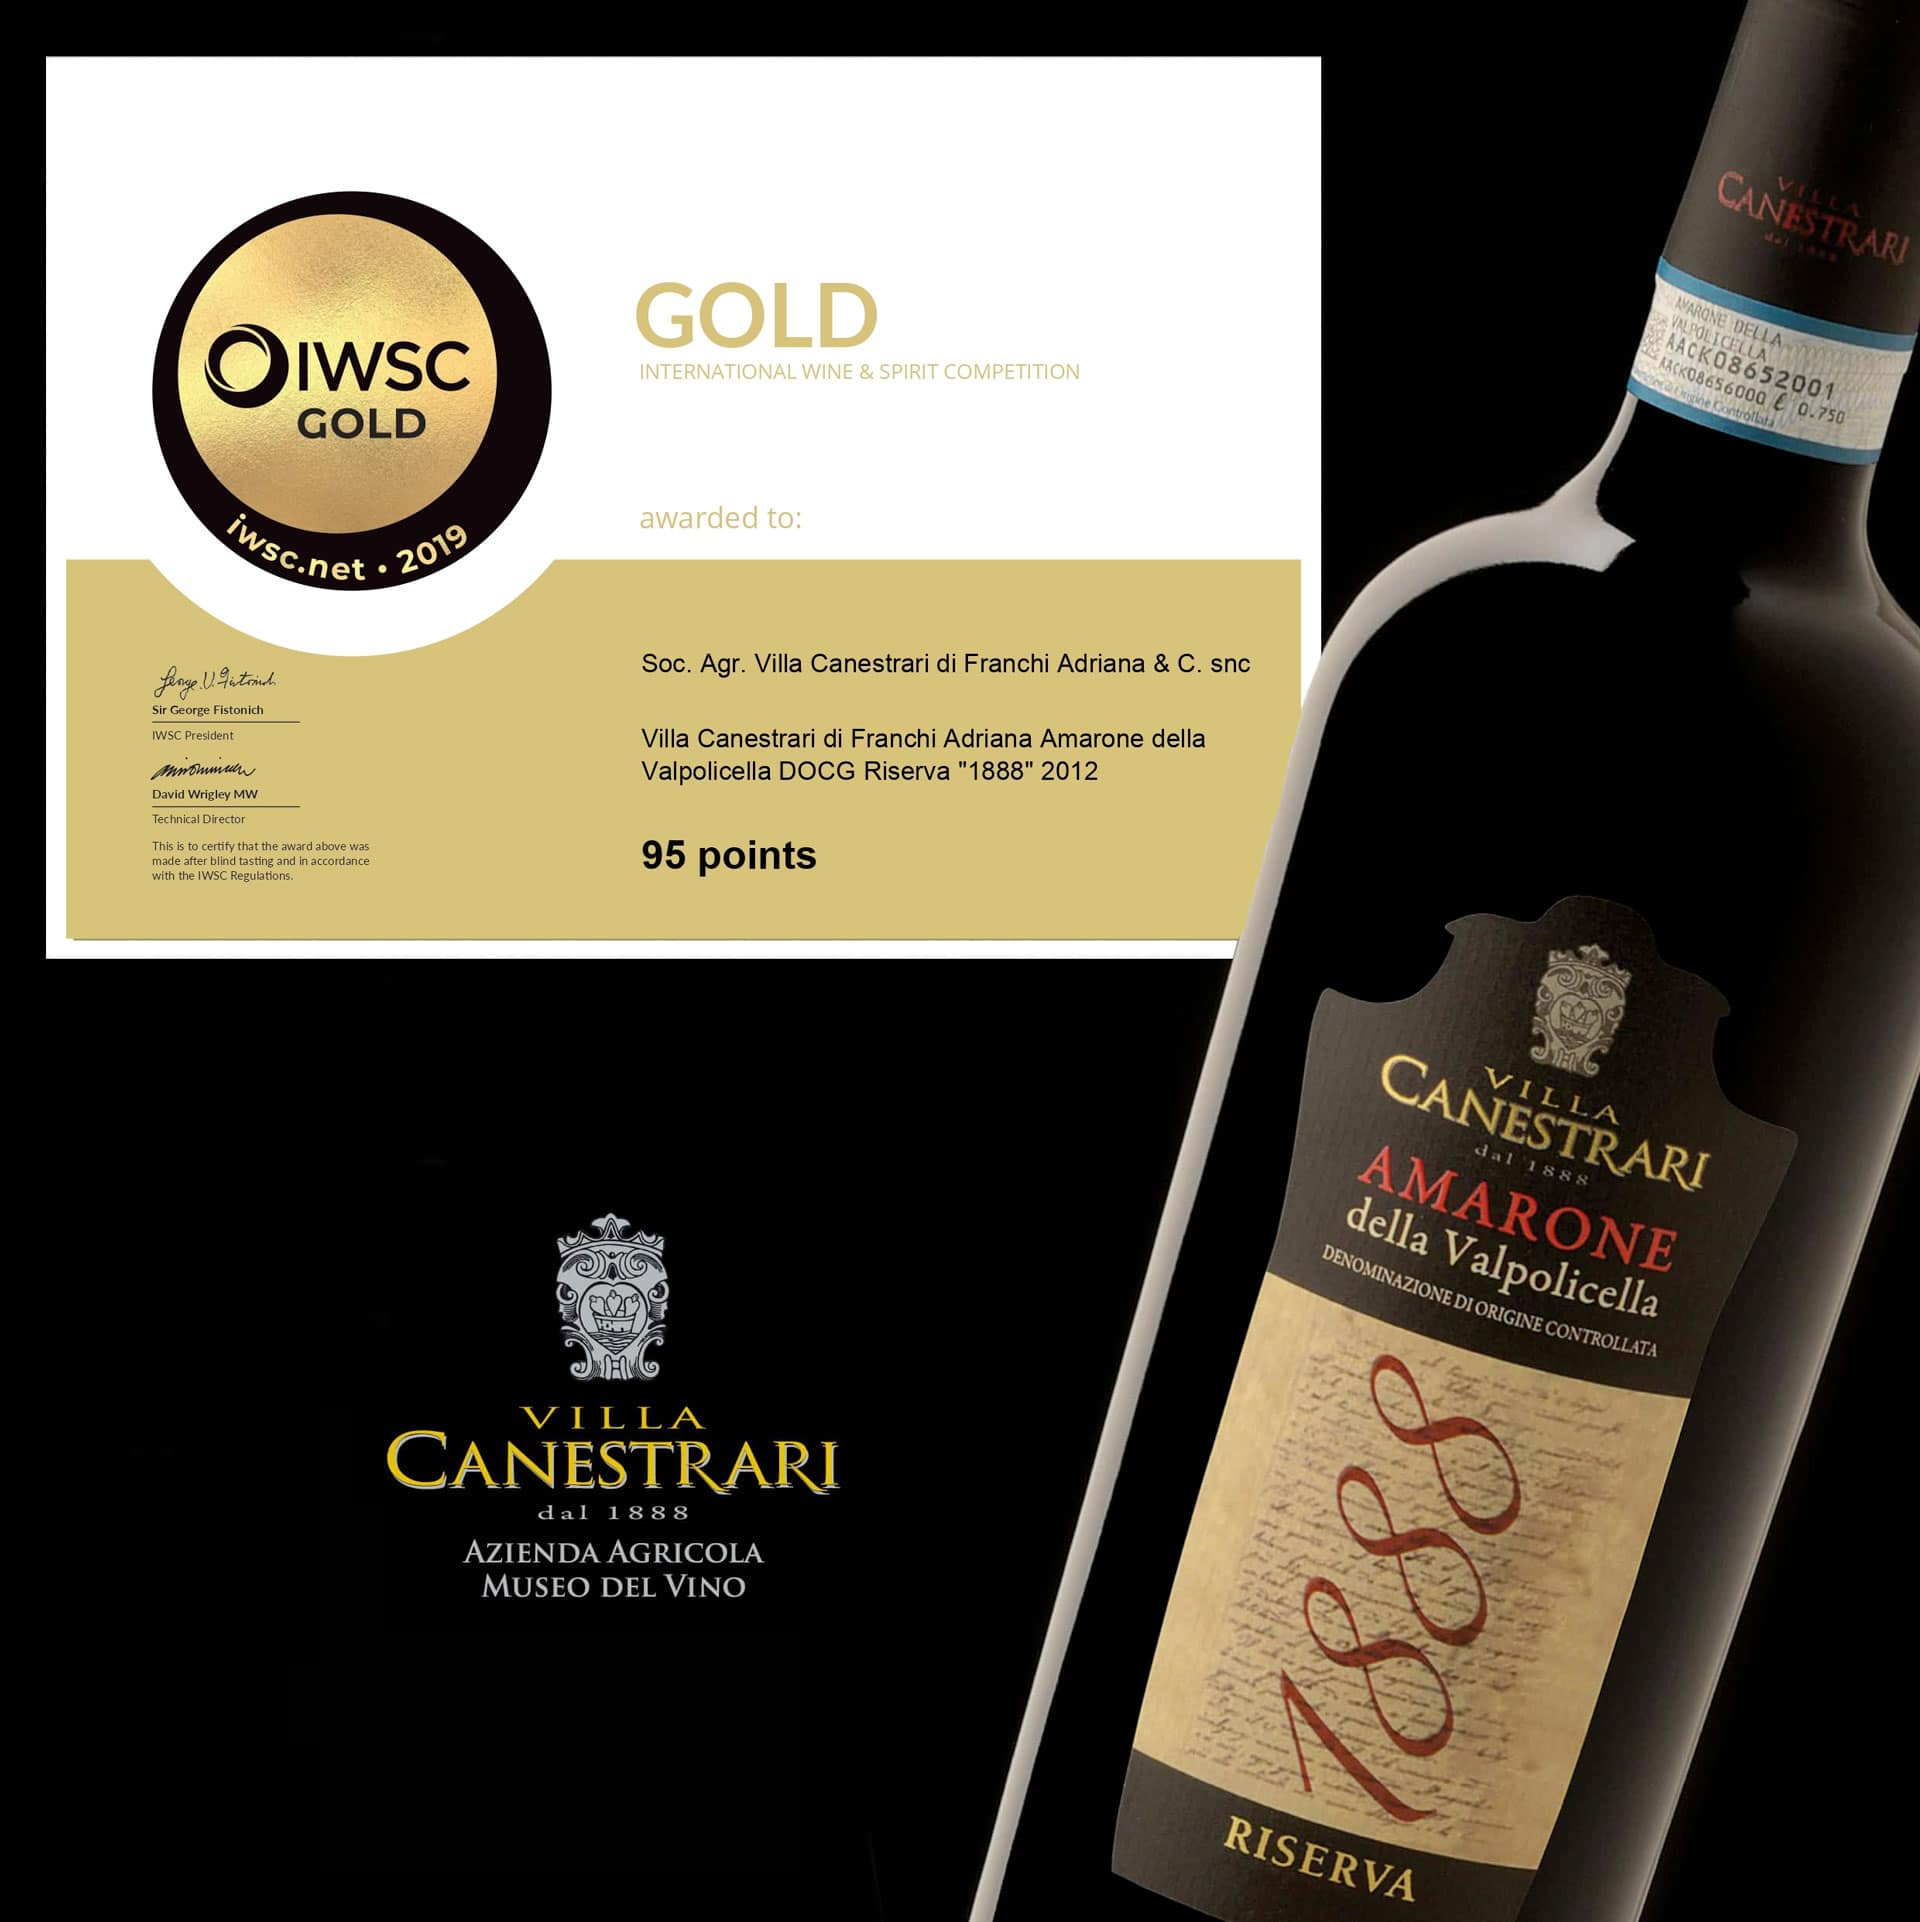 Premio IWSC gold home villa Canestrari